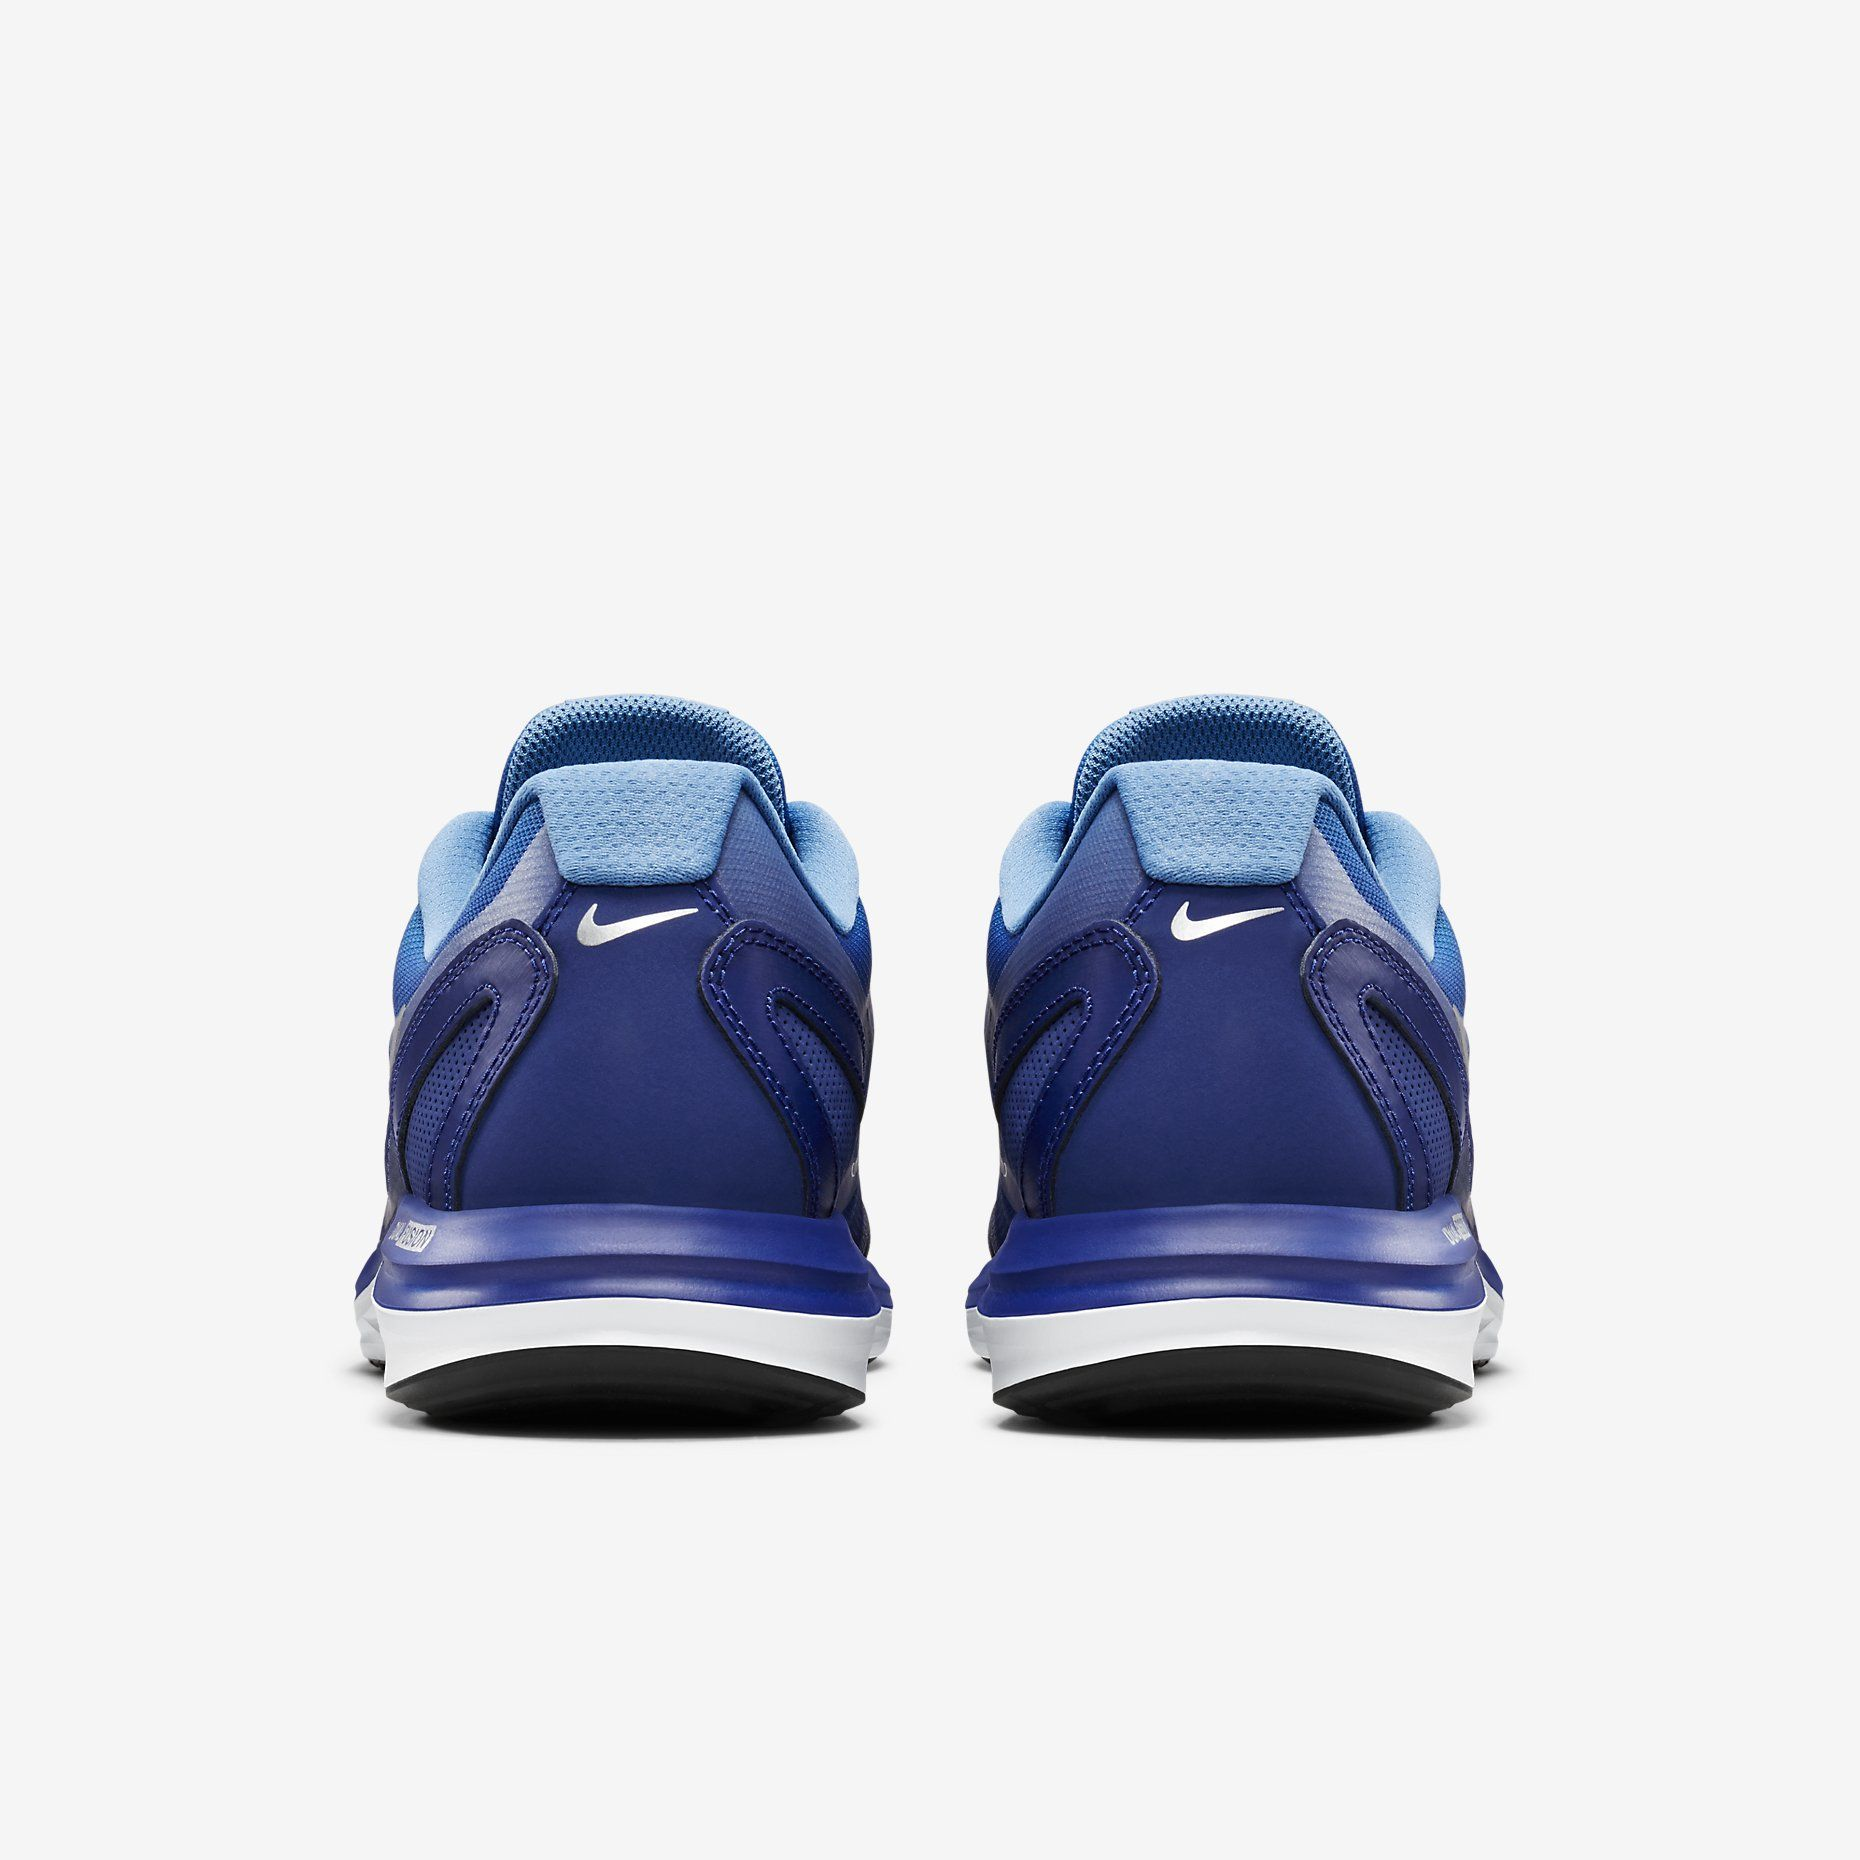 bf3c9c64197932 Nike Dual Fusion Run 3 Premium Men s Running Shoe. Nike Store